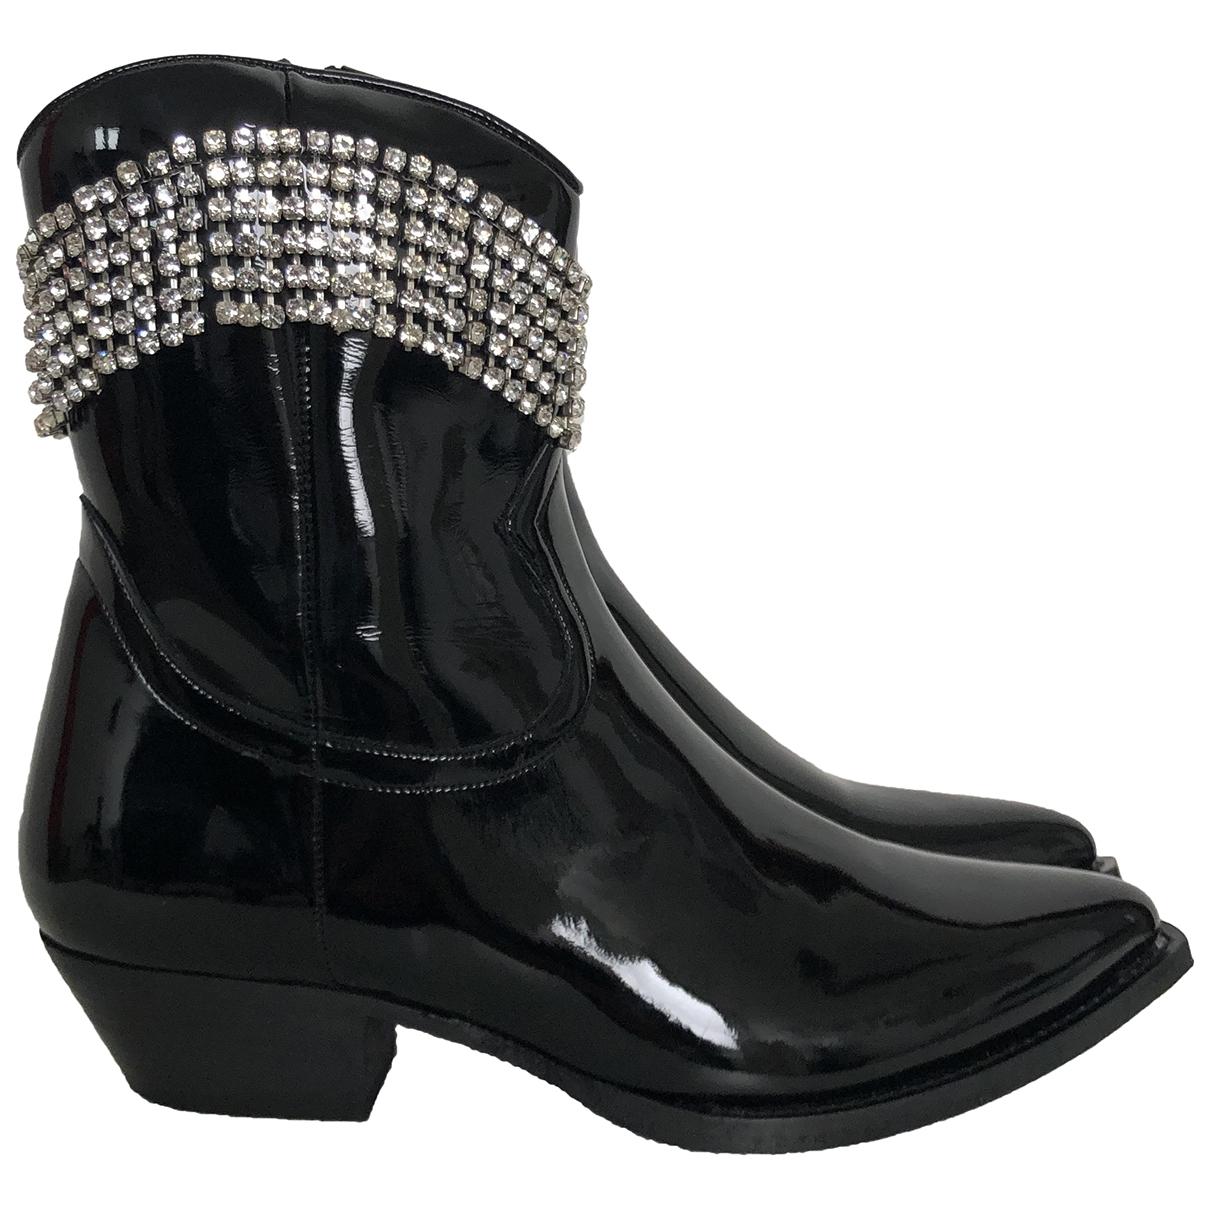 Chiara Ferragni \N Black Patent leather Boots for Women 38 EU